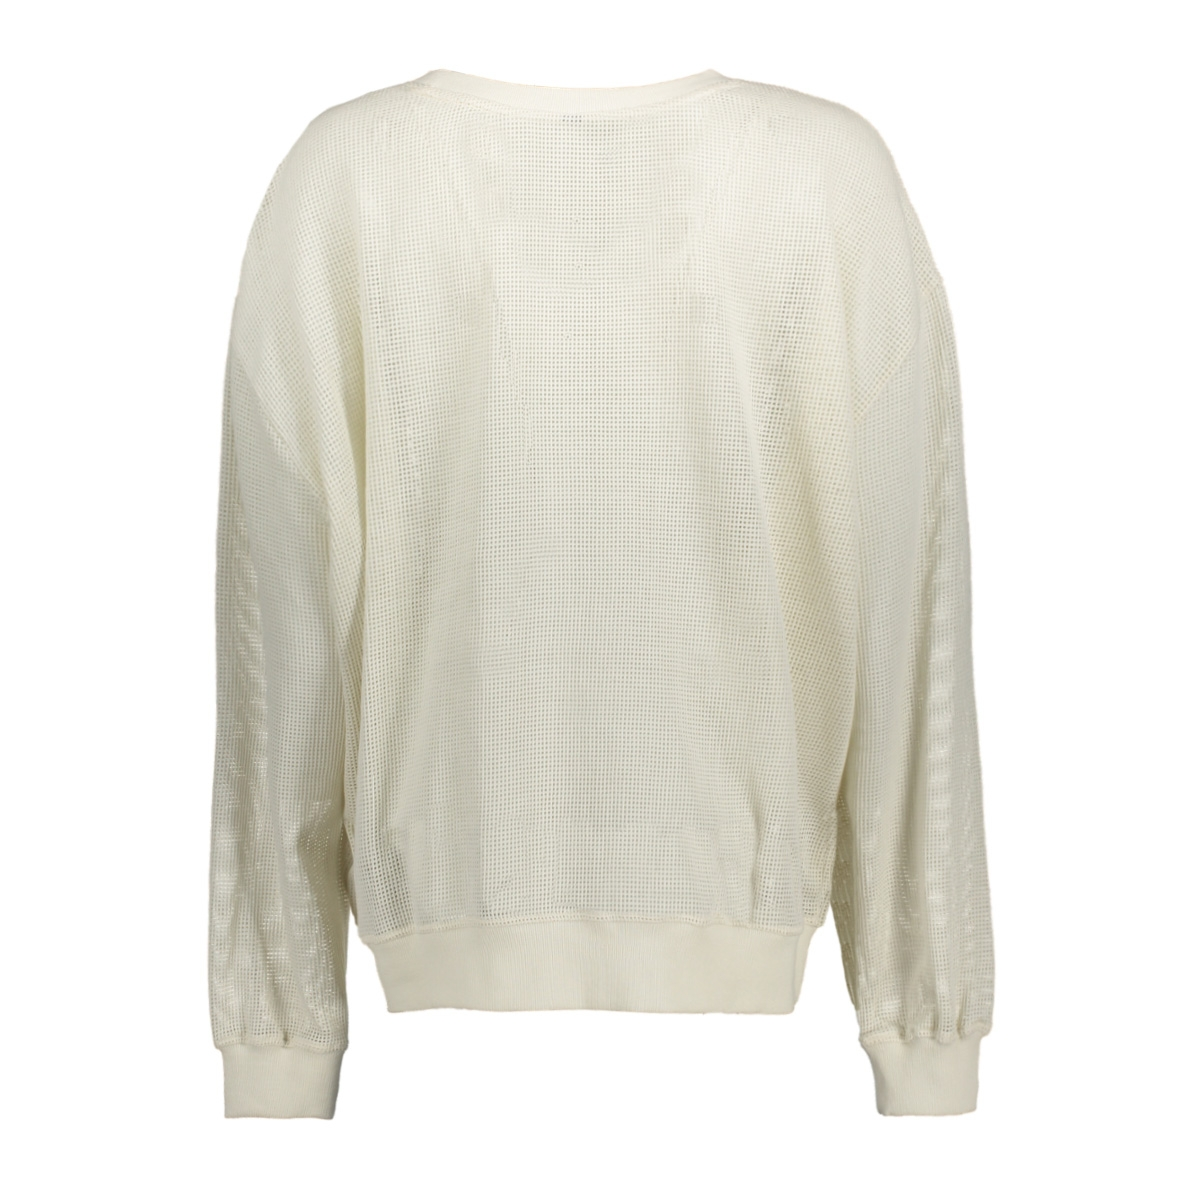 20-817-7103 10 days sweater bone